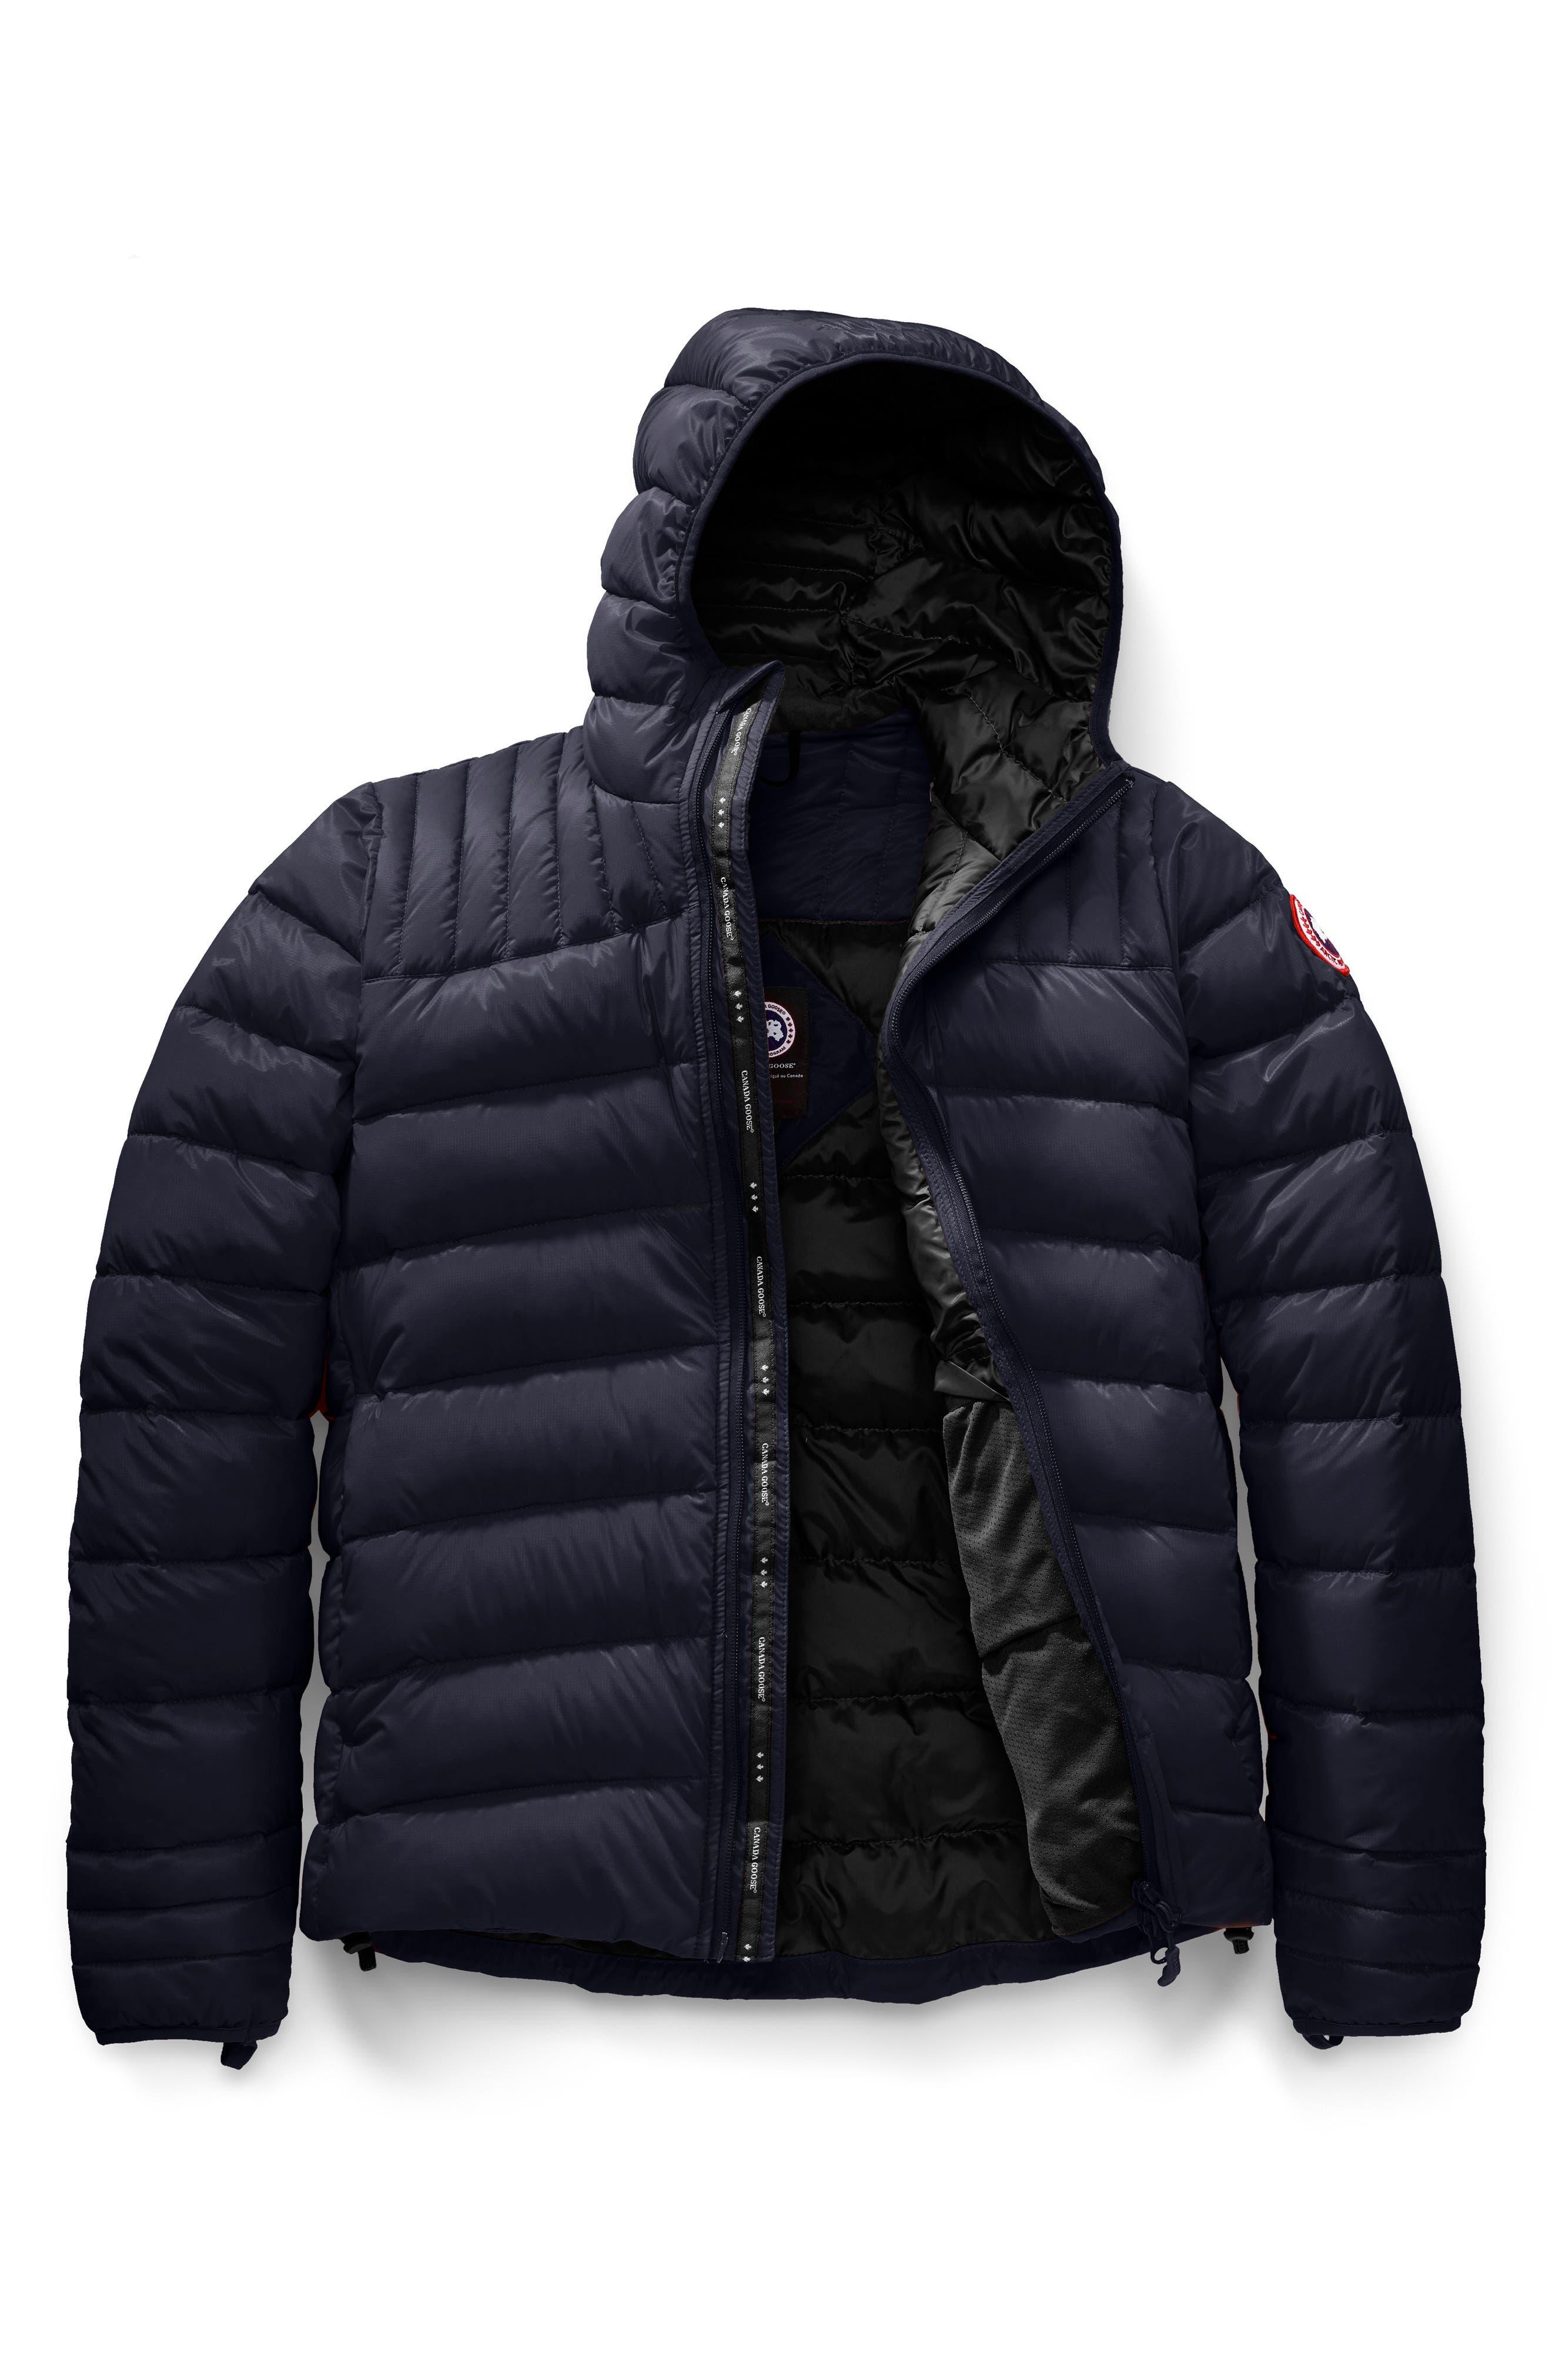 CANADA GOOSE, Brookvale Slim Fit Hooded Down Jacket, Alternate thumbnail 5, color, ADMIRAL BLUE/ BLACK